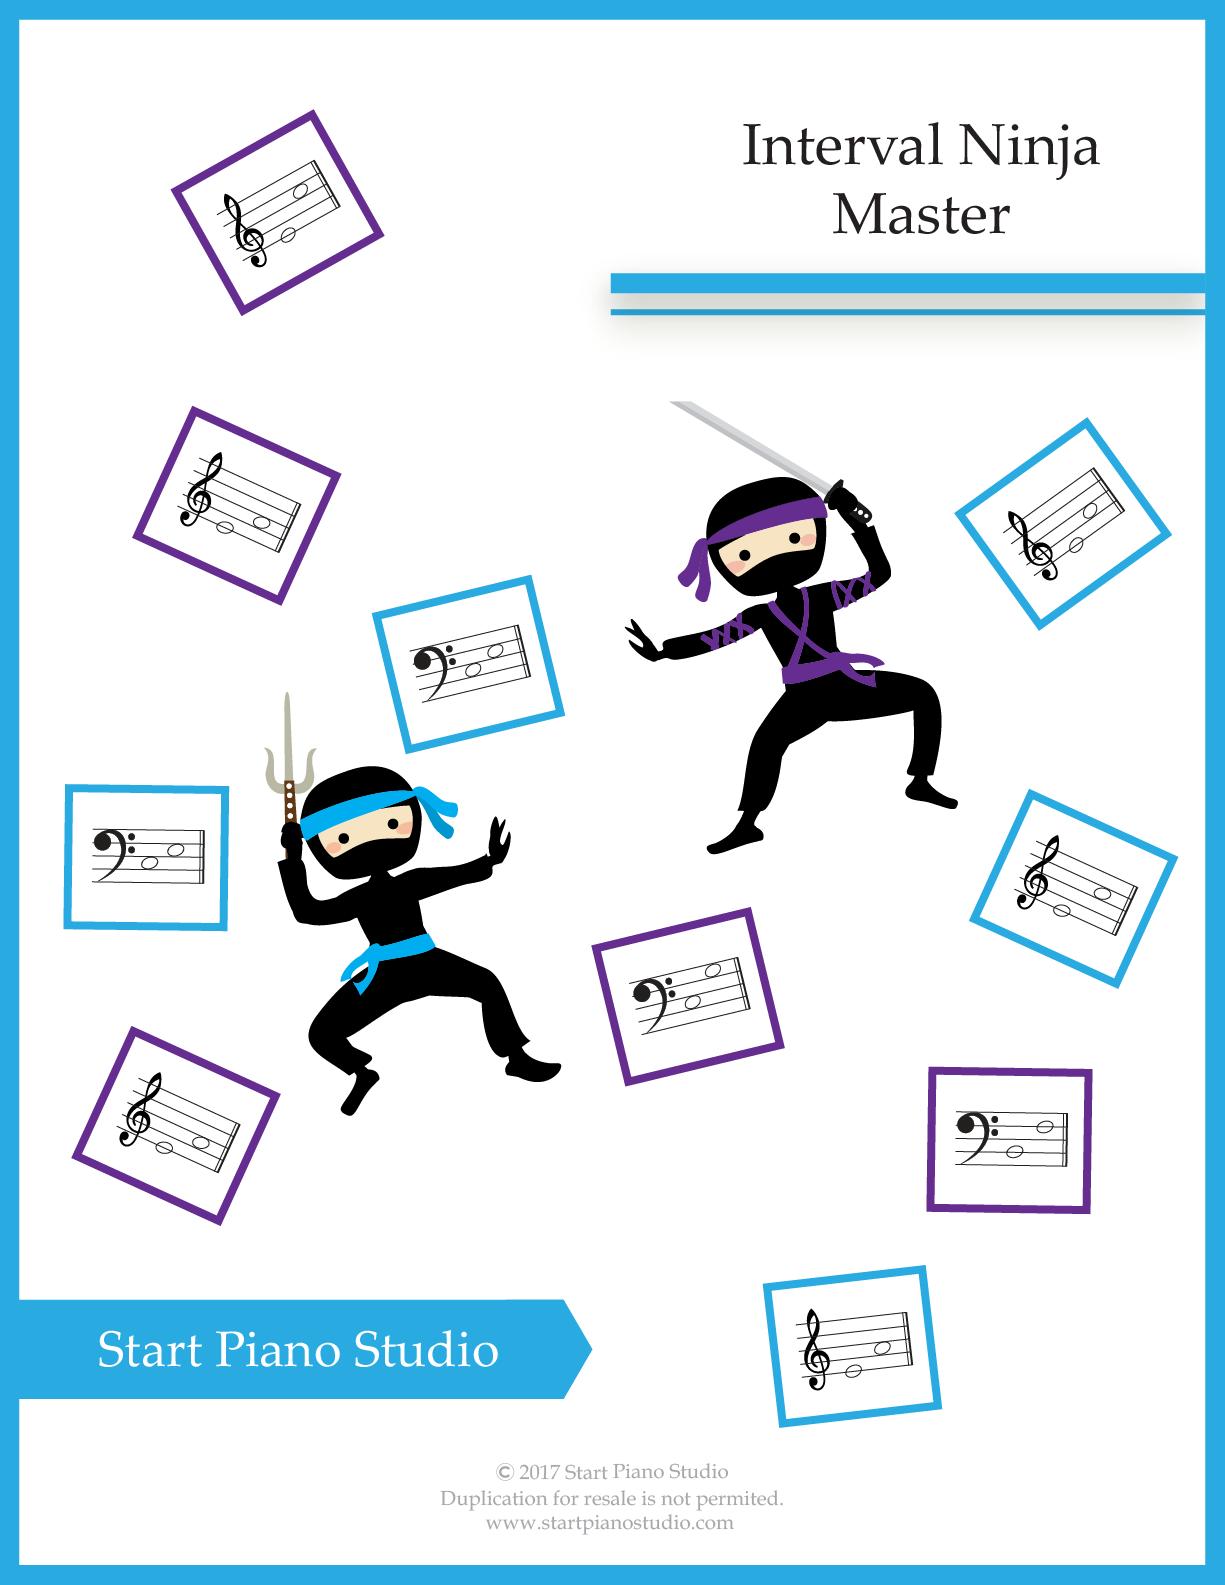 Interval Ninja Master Piano Heroes Ninja Master Learn Piano Piano Teaching Resources [ 1585 x 1225 Pixel ]